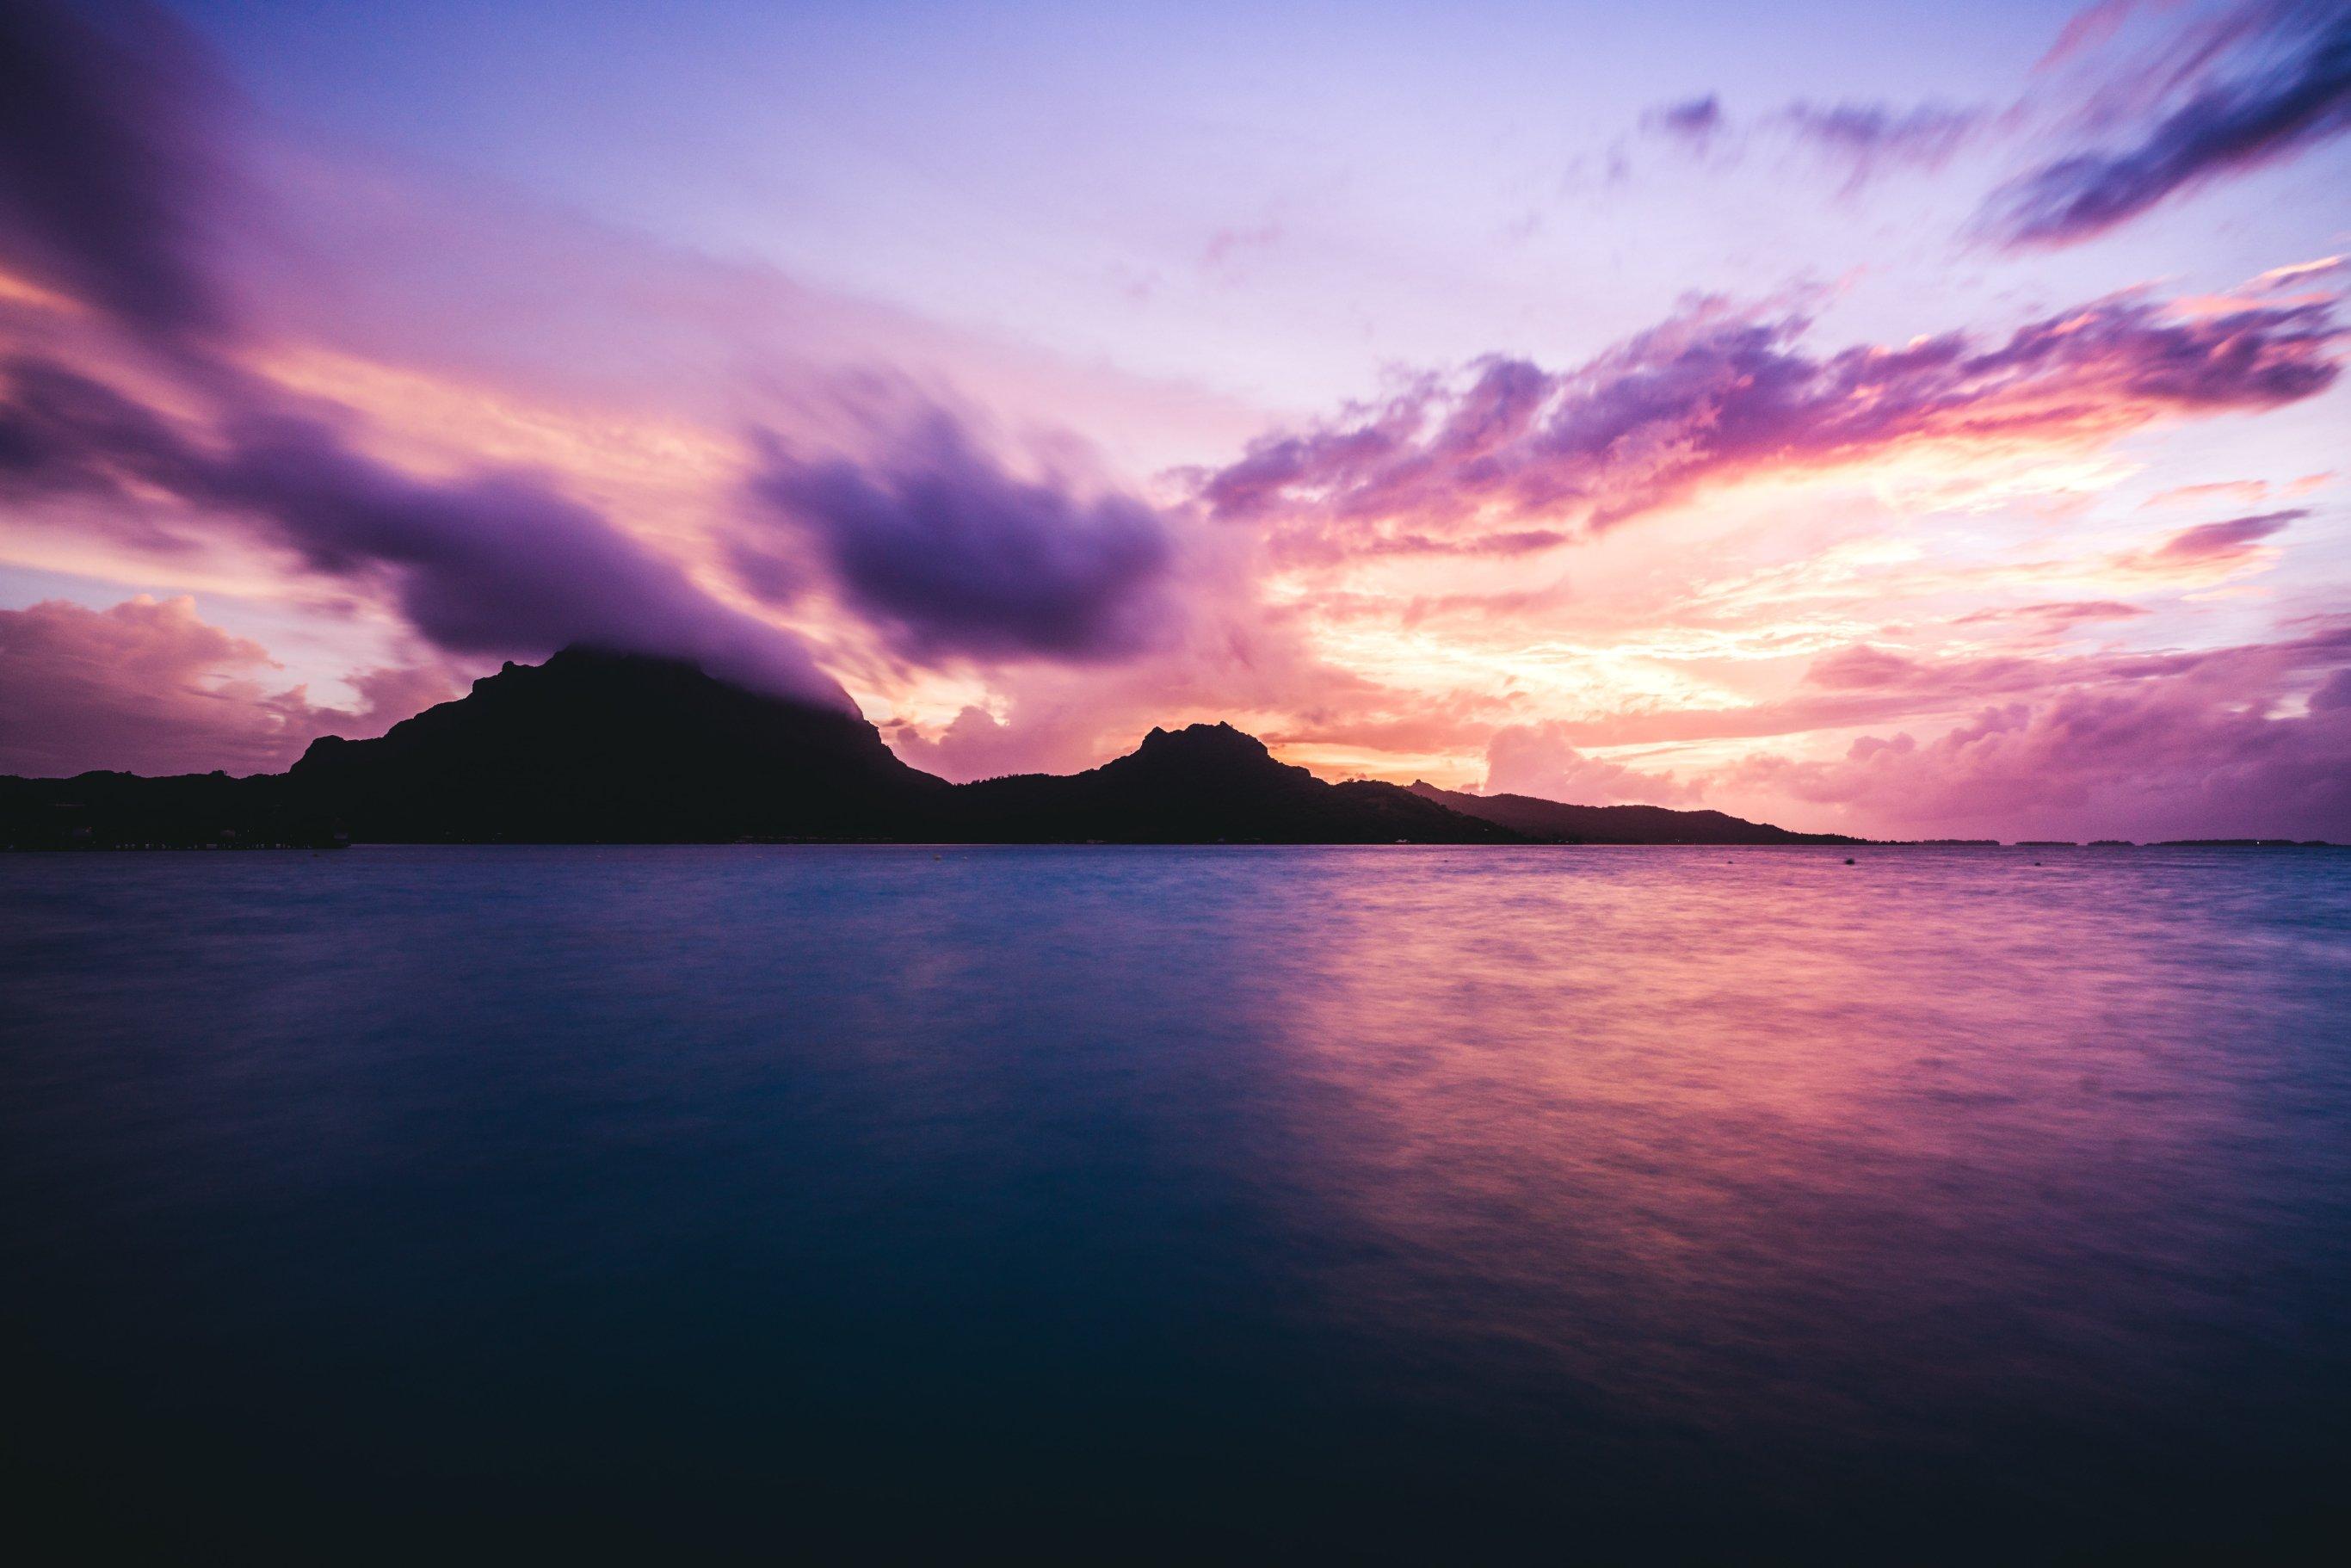 7-Day Moorea and Bora Bora In Style - French Polynesia Itinerary